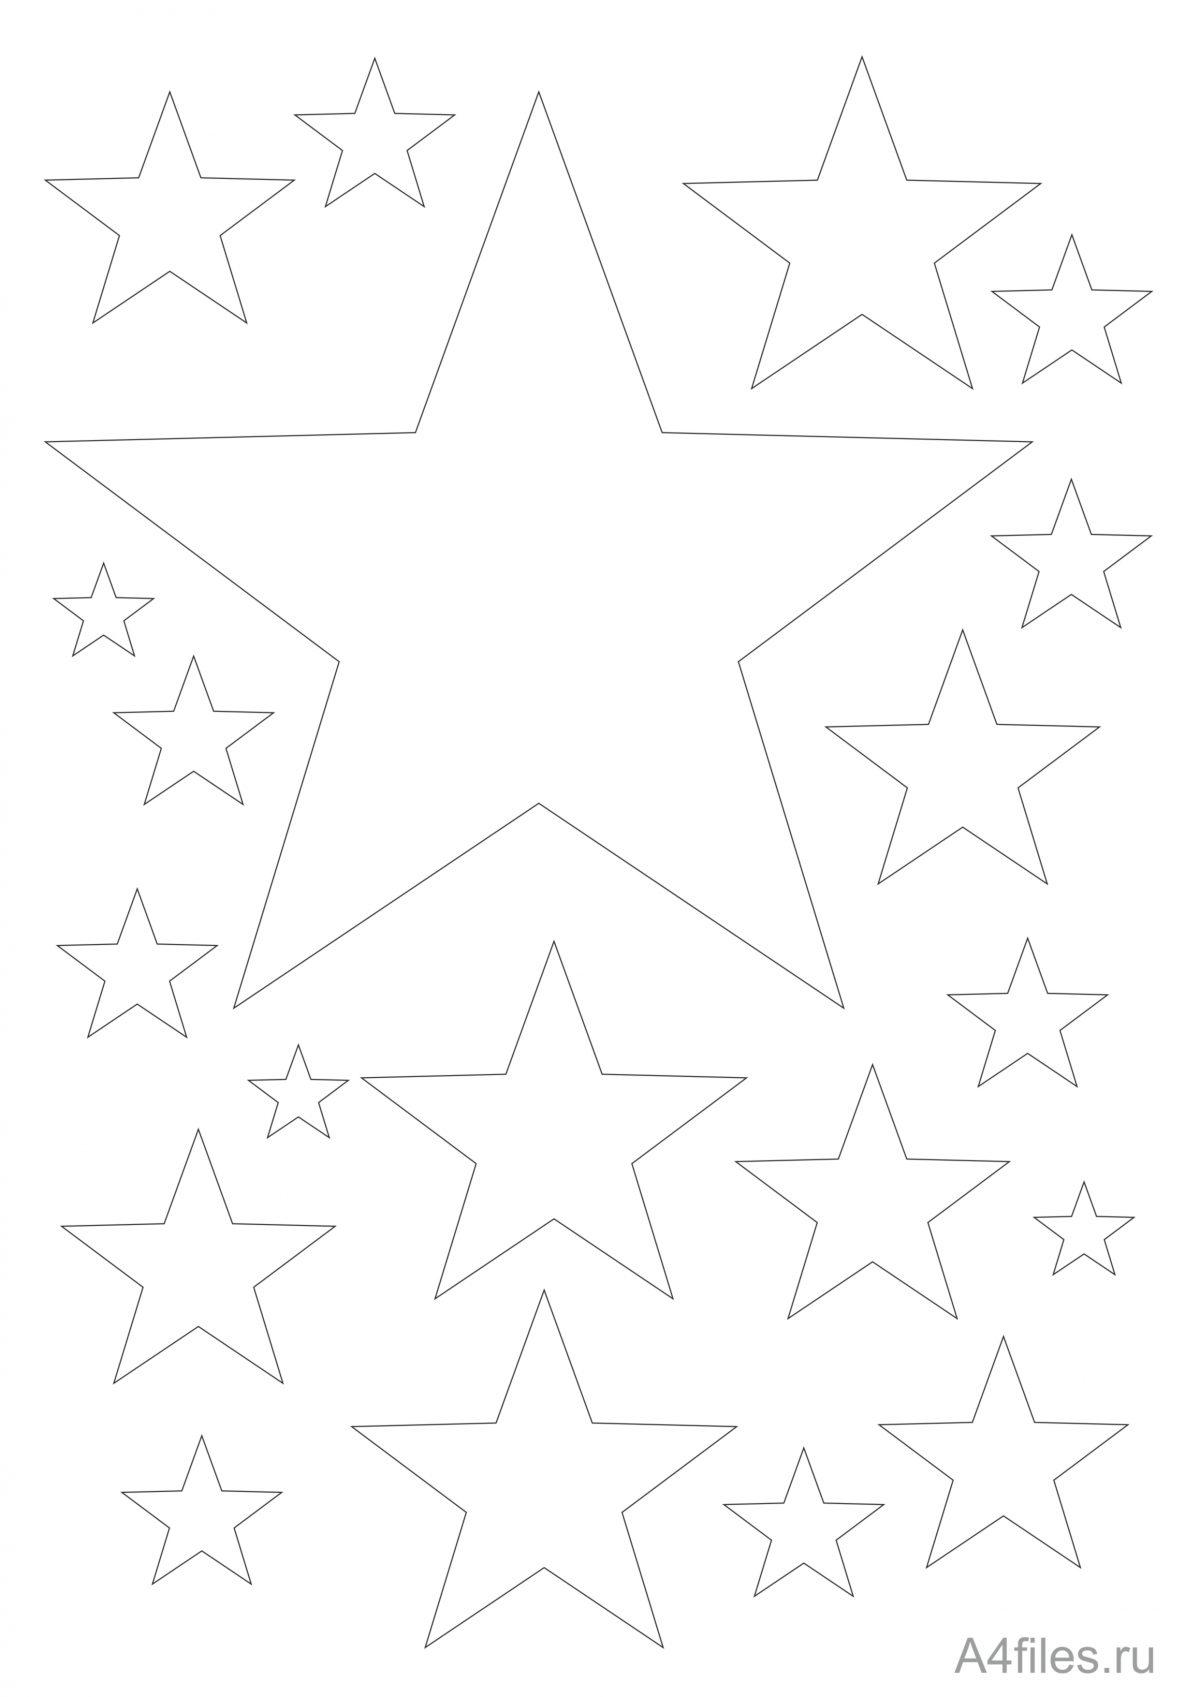 Шаблон звезды распечатать на бумаге А4